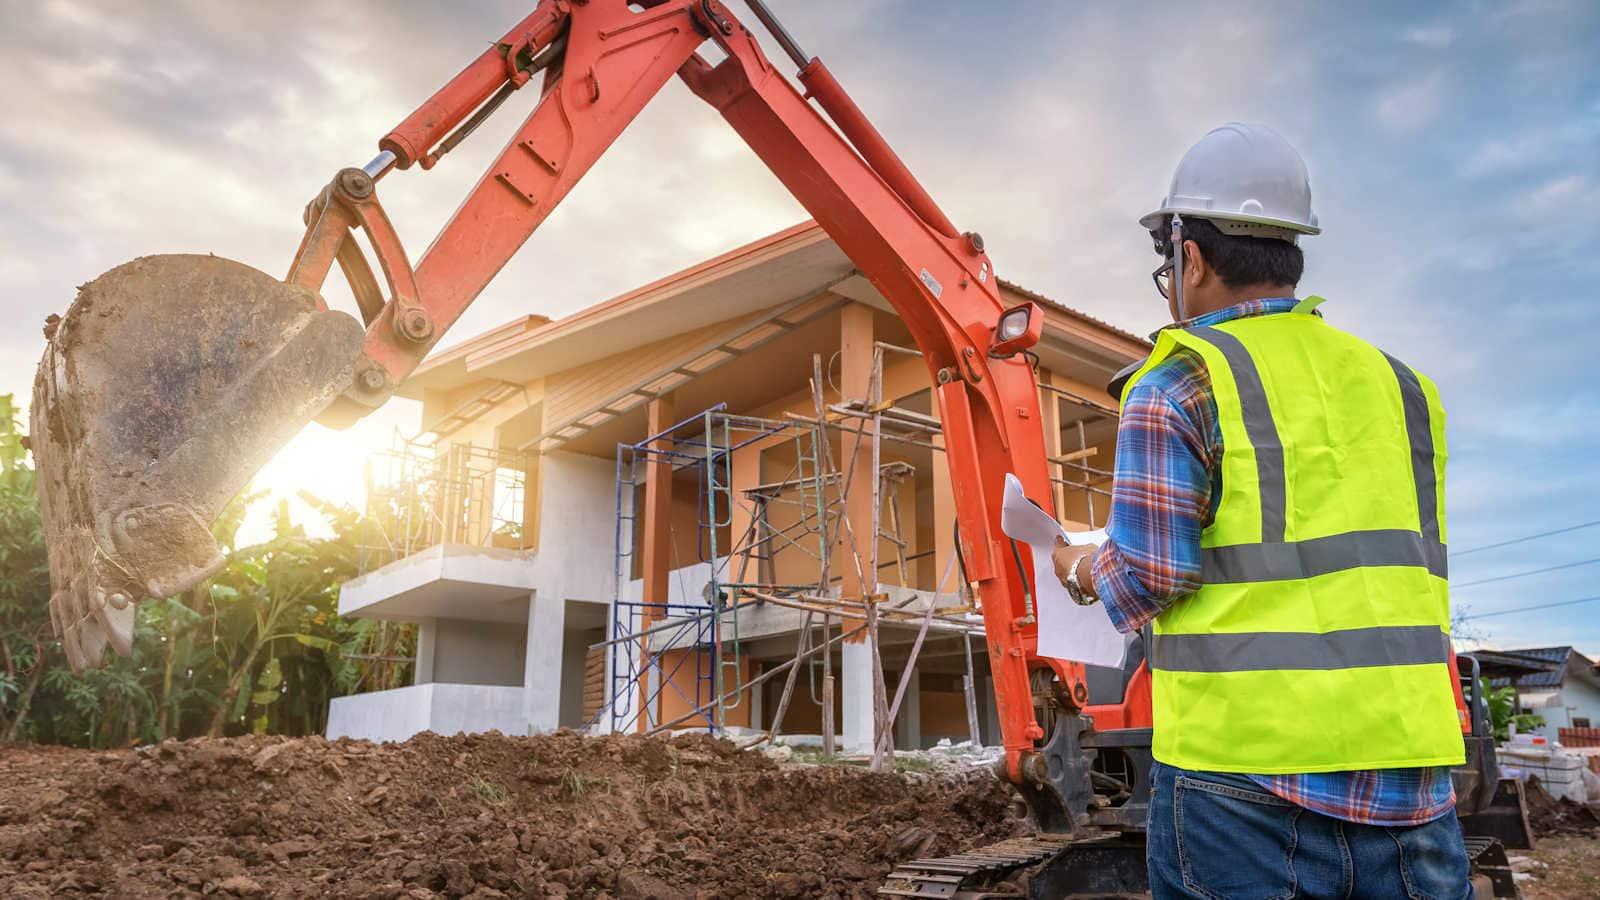 DFW Construction Services in Arlington